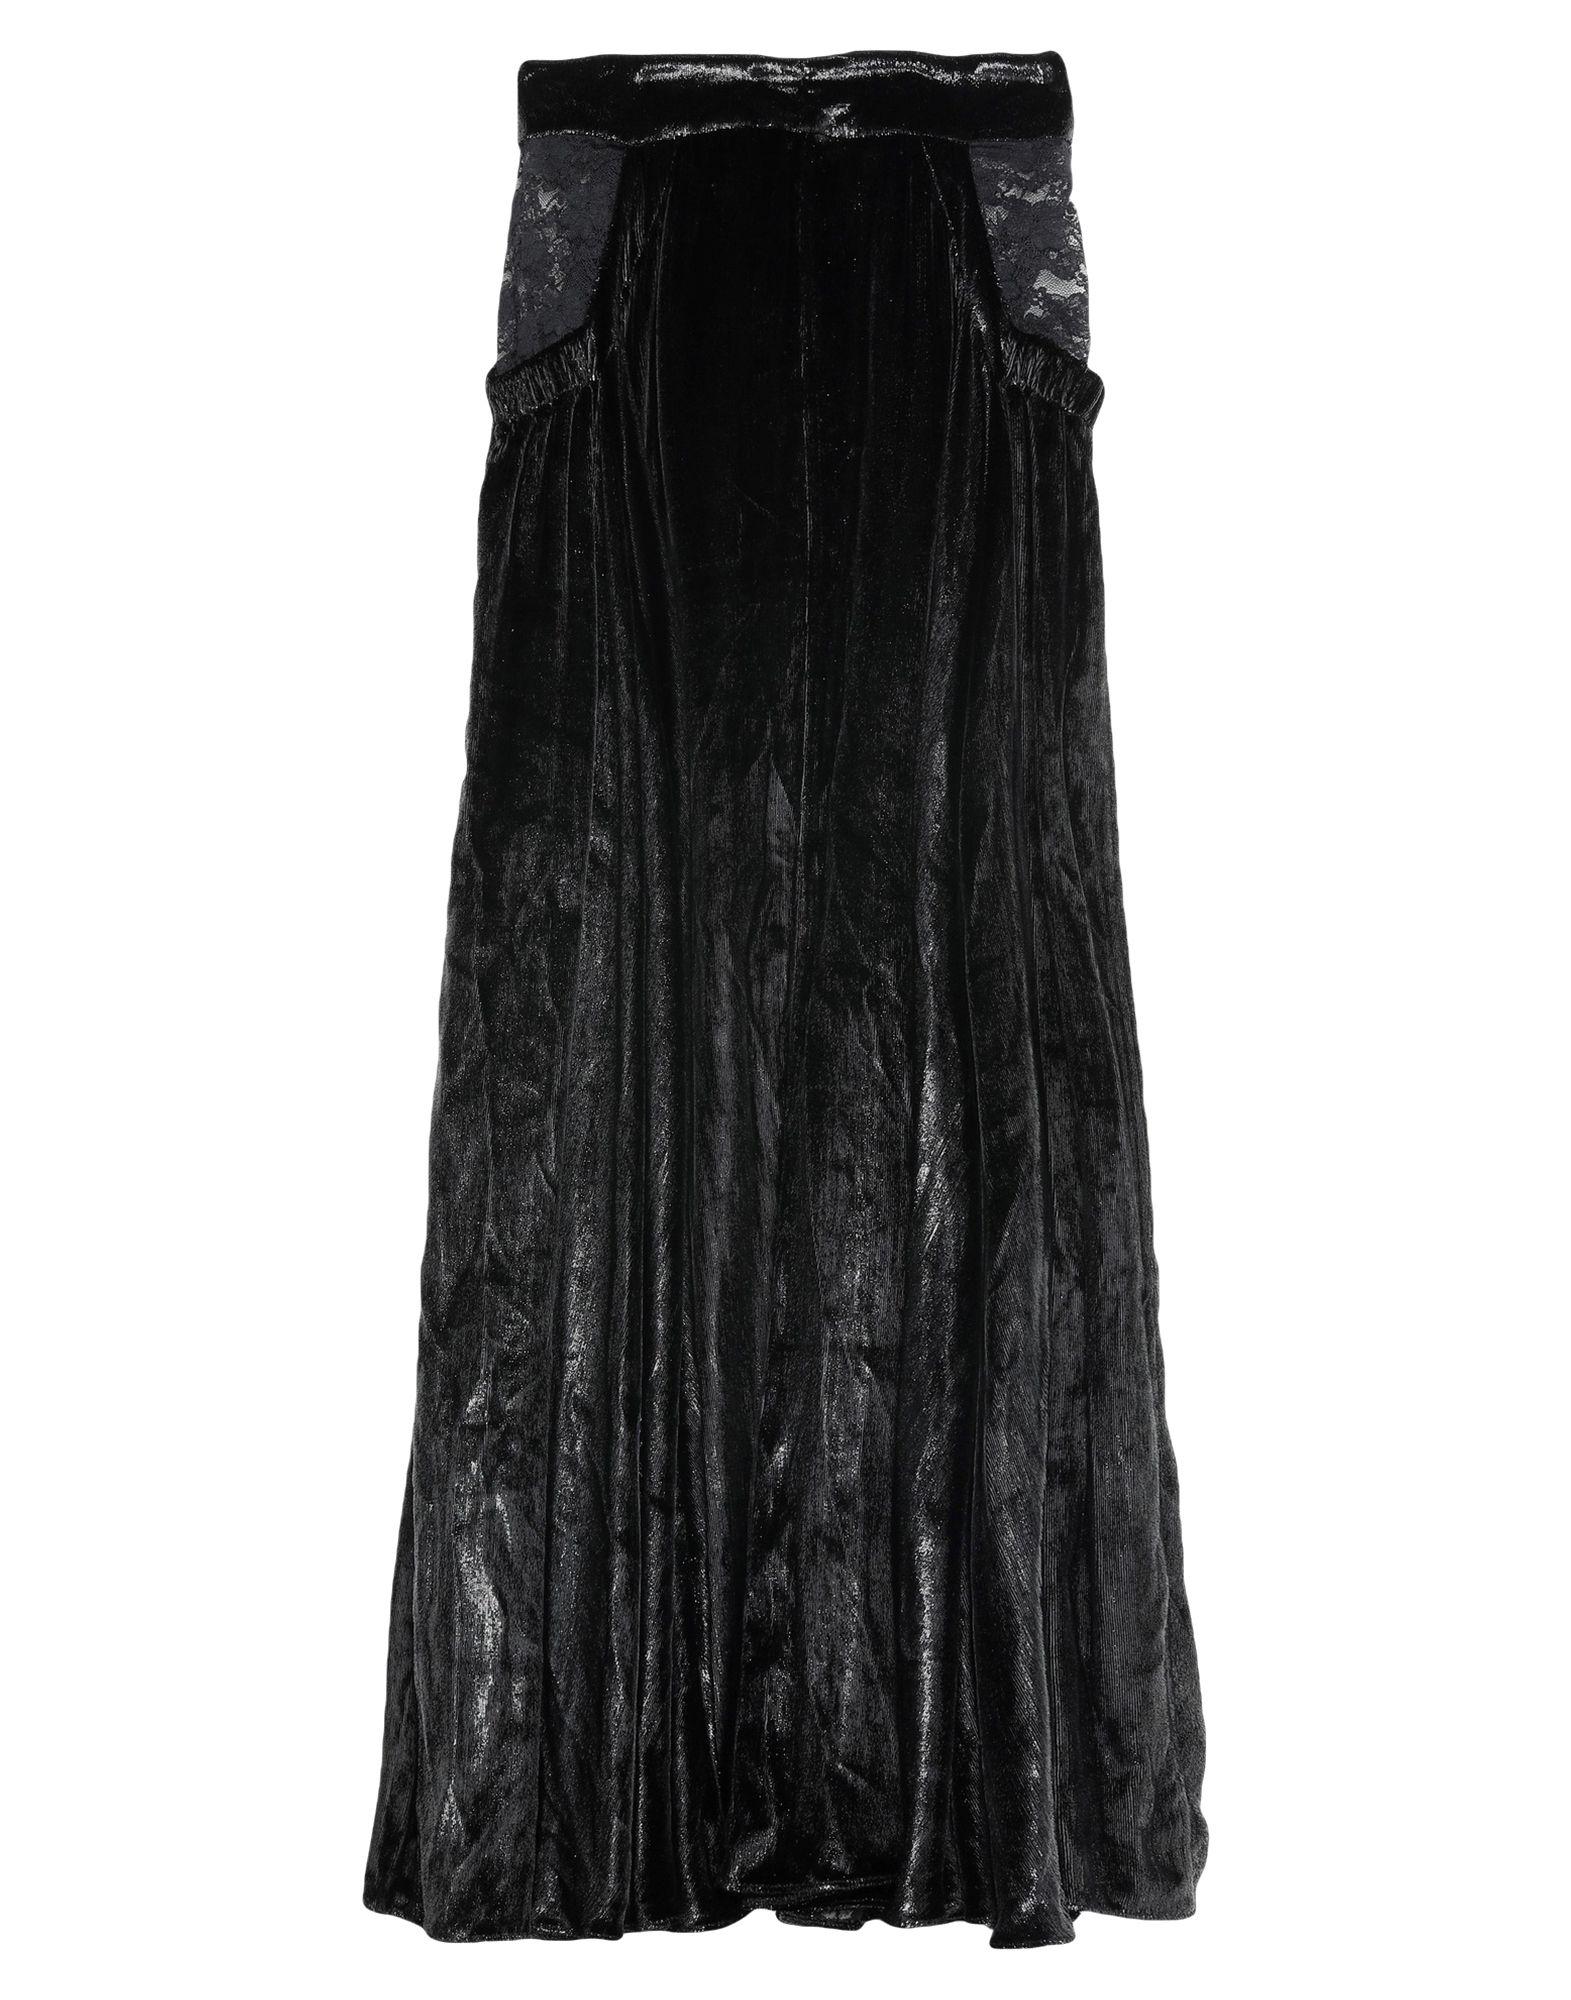 MICHAEL LO SORDO Длинная юбка